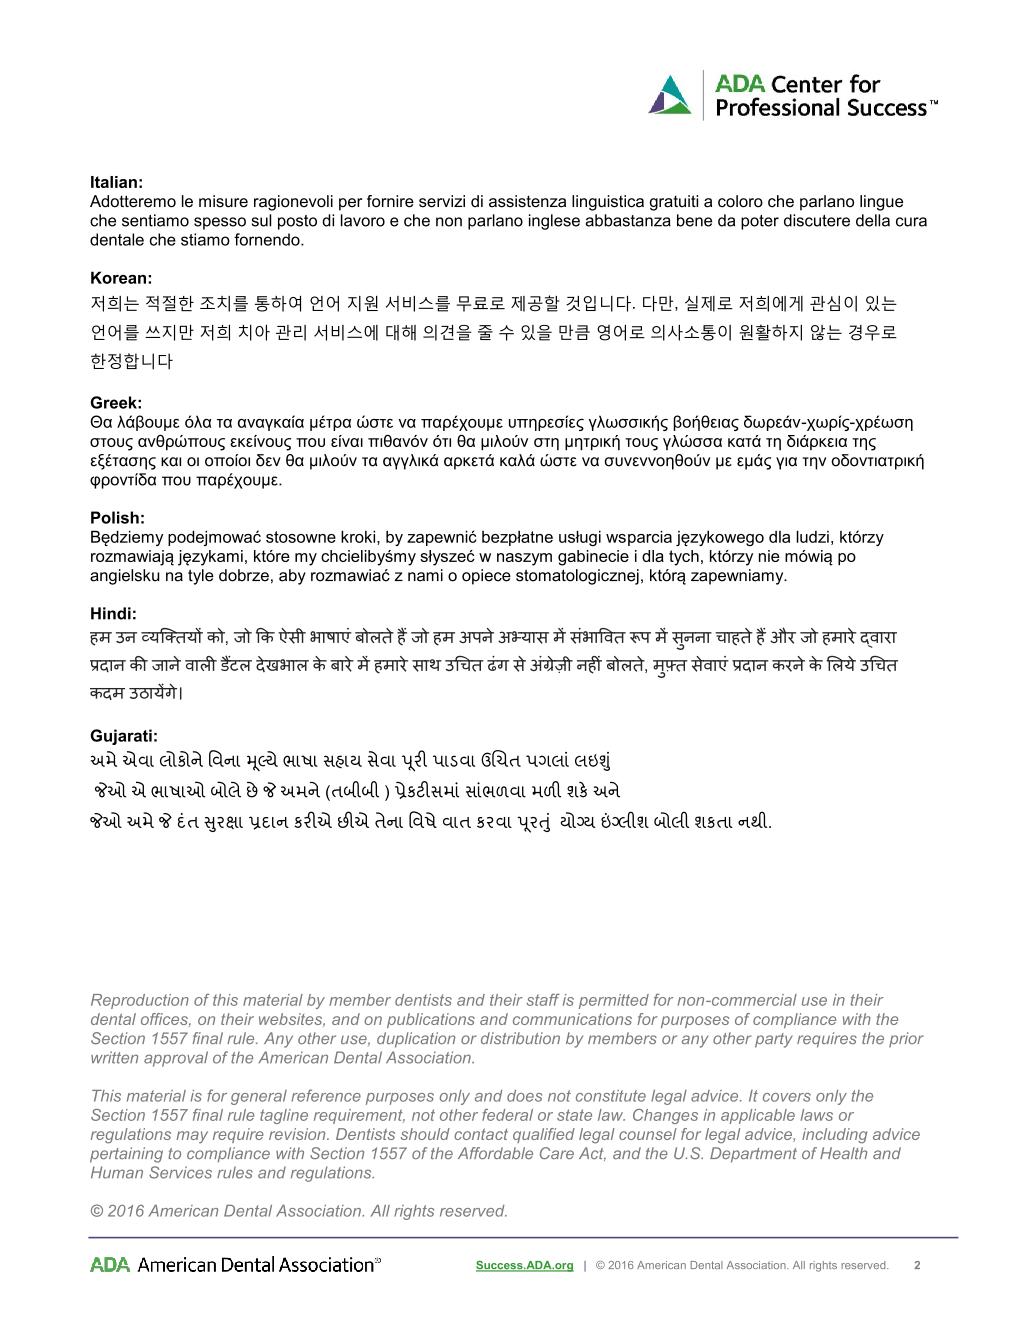 ADA translation form page 2